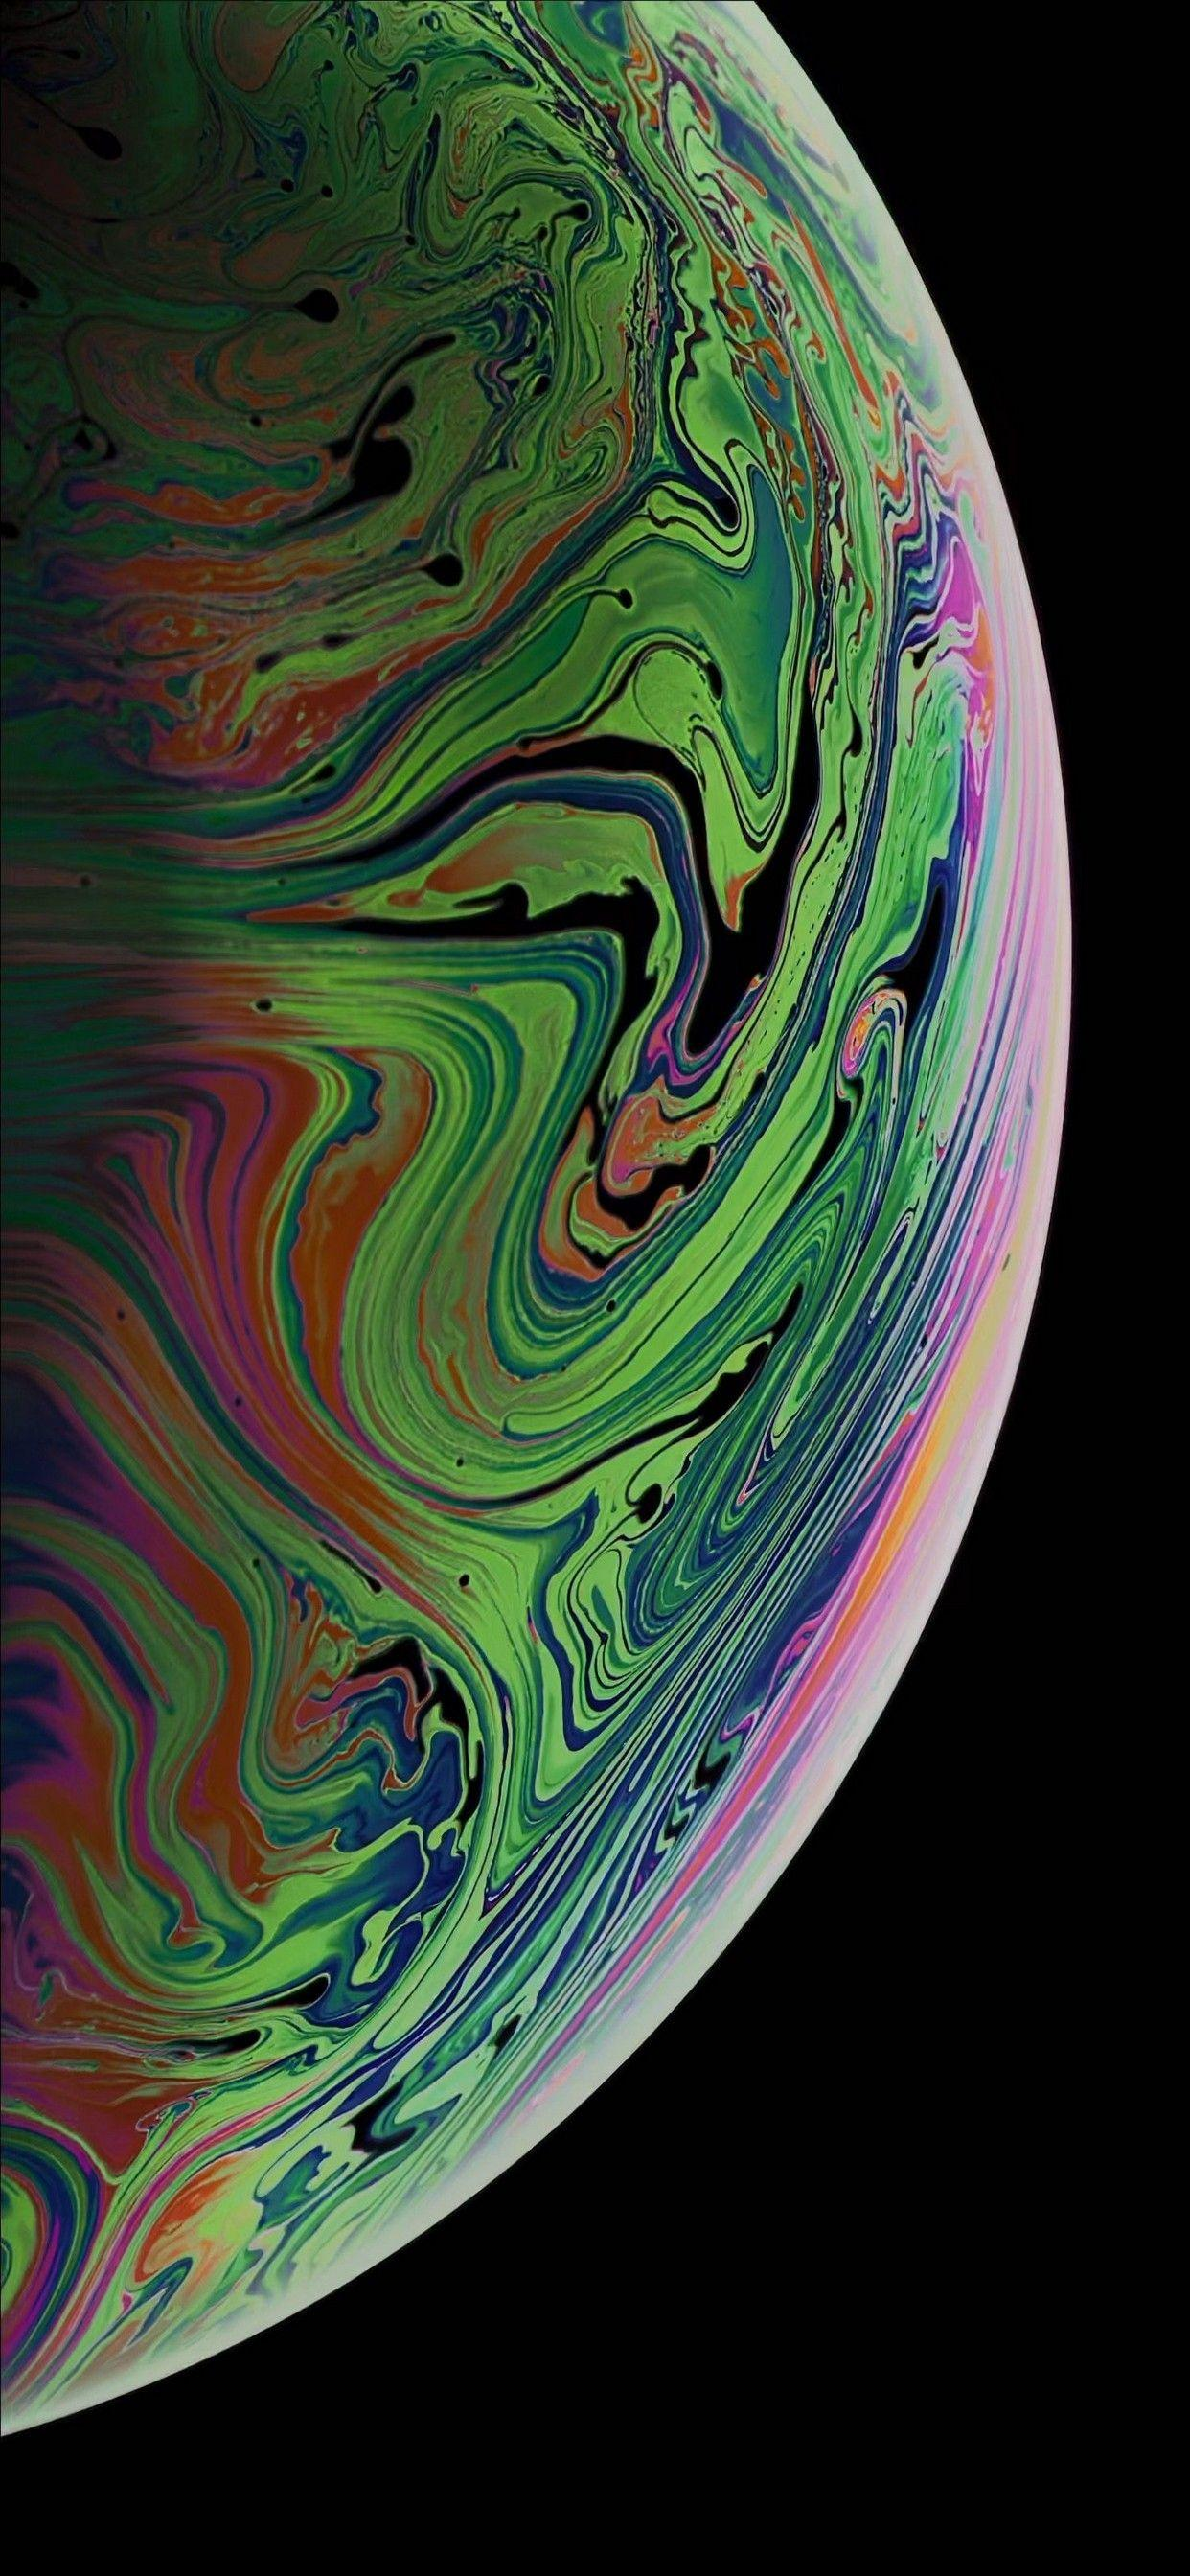 iPhone Xs Max 4k HD Wallpapers - Wallpaper Cave